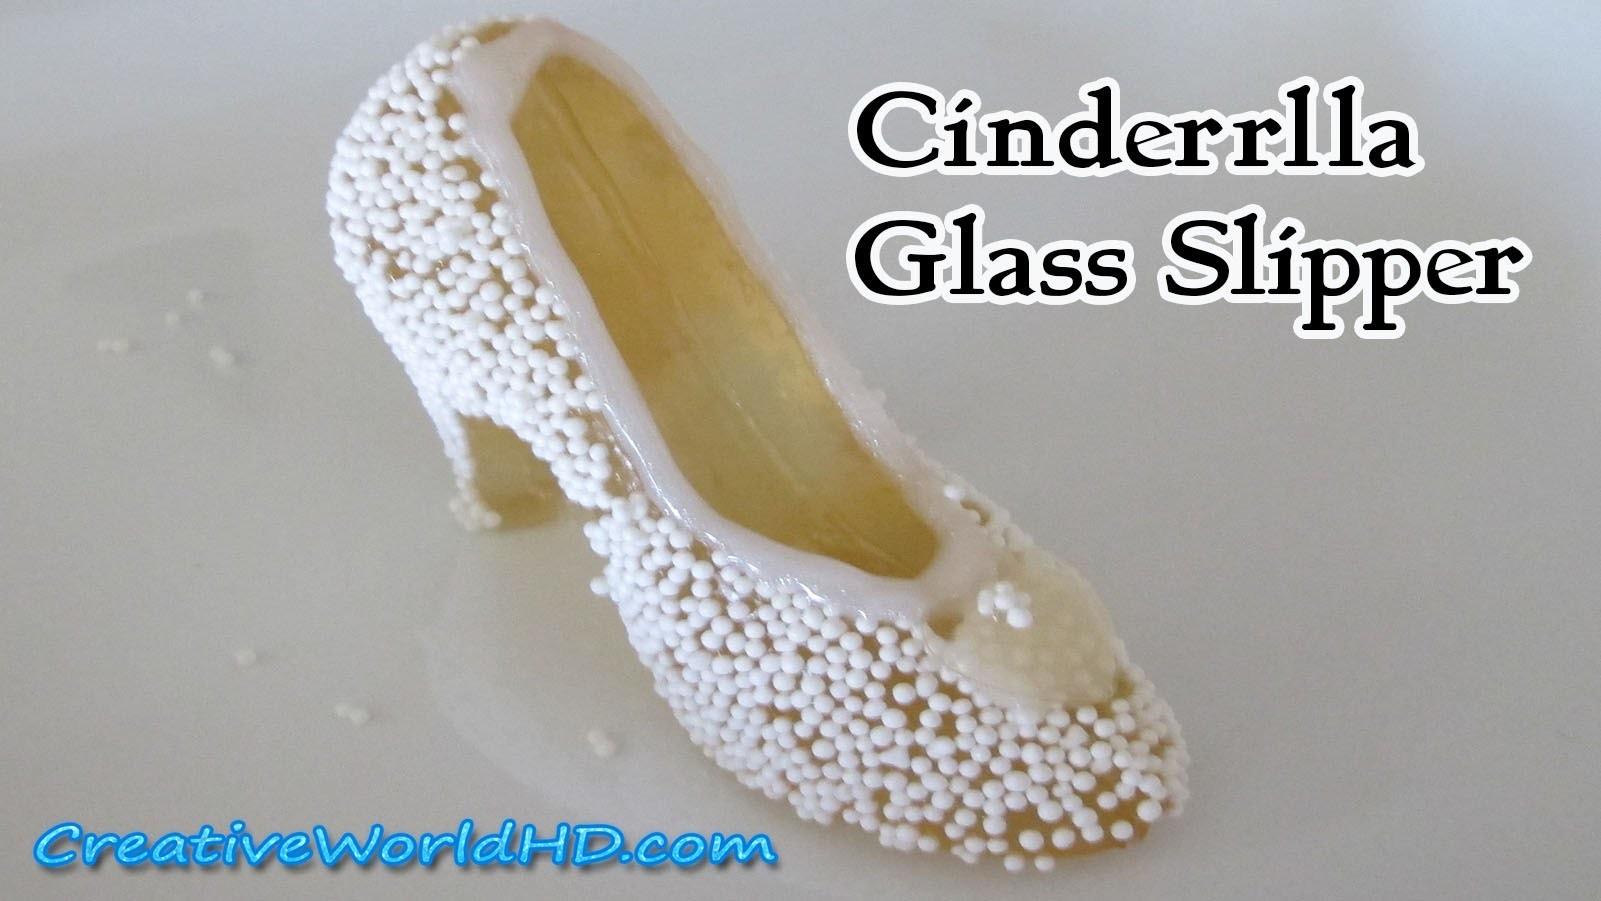 DIY Cinderella Glass Slipper.Shoe - Geltain.Jello.Jelly Mix - How to Tutorial